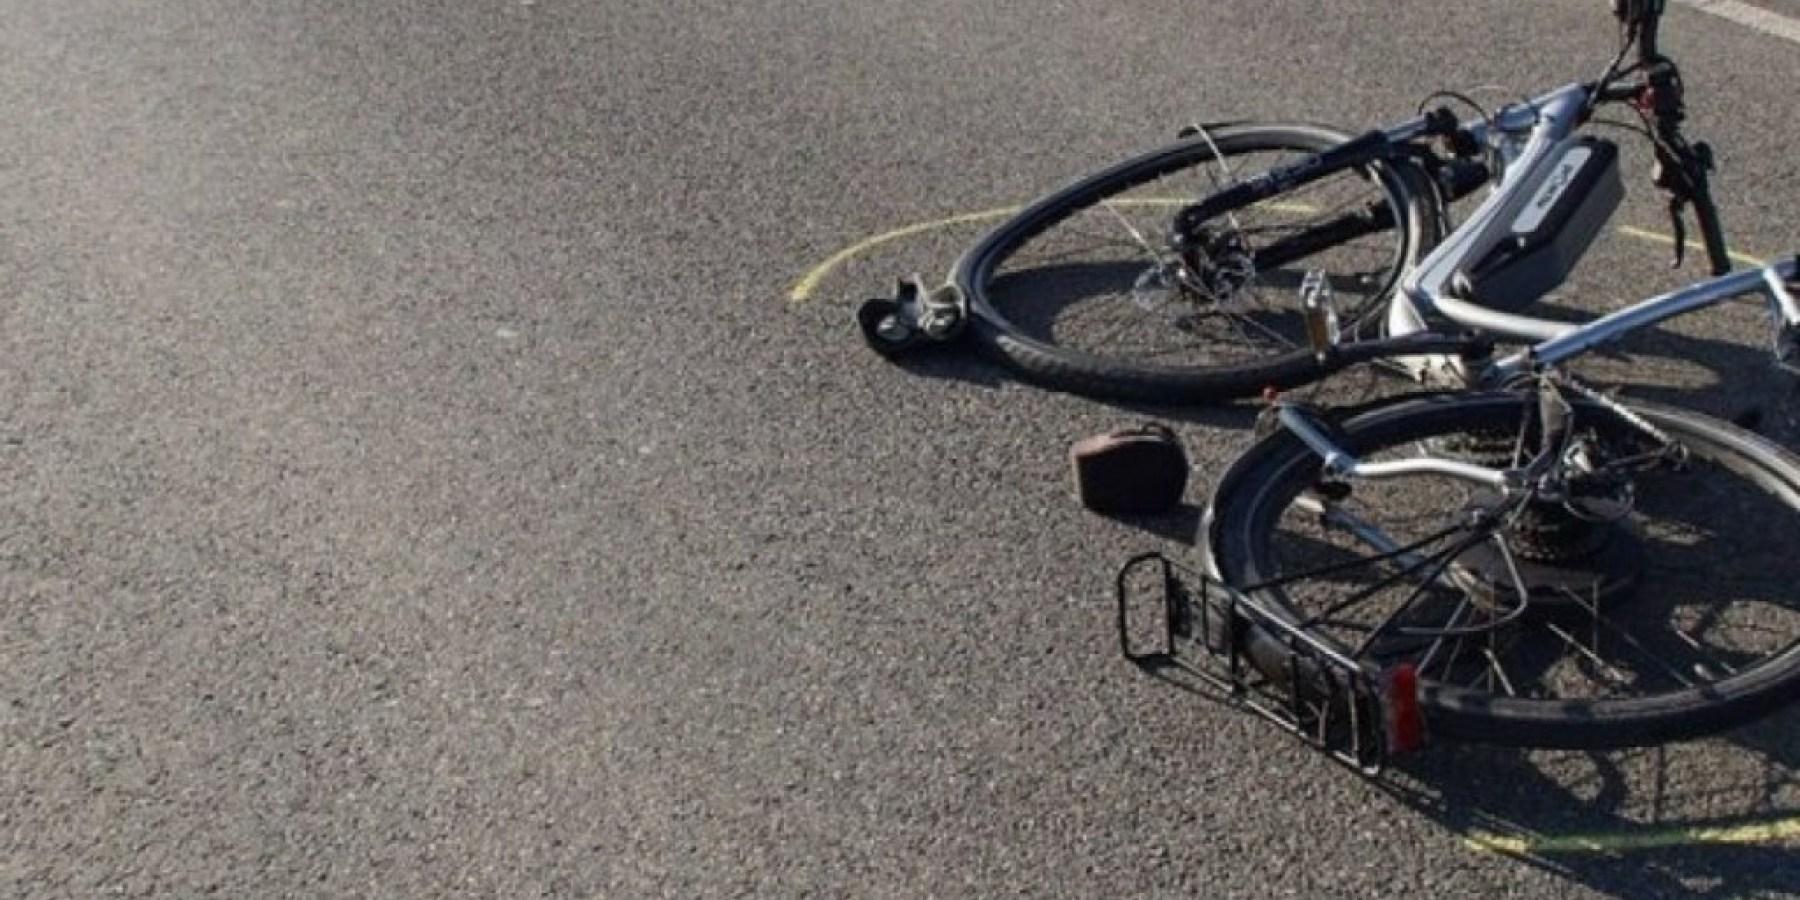 Radfahrerin nach Abbiegeunfall leicht verletzt – Pkw-Fahrer flüchtet